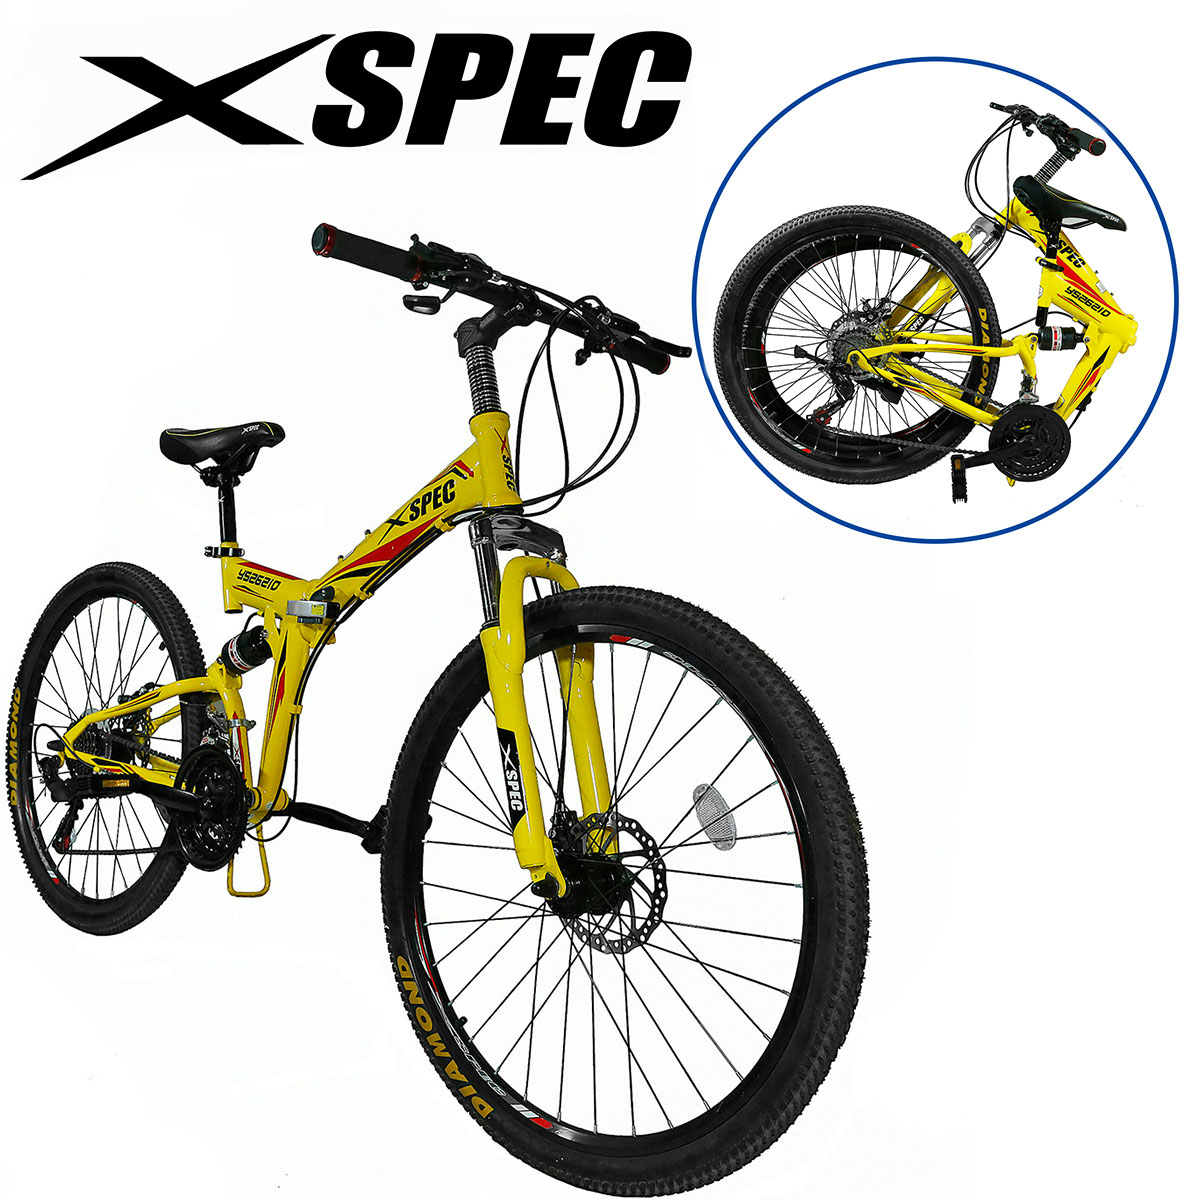 "Xspec 26"" 21 Speed Folding Mountain Bike Bicycle Trail Commuter Shimano, Black"